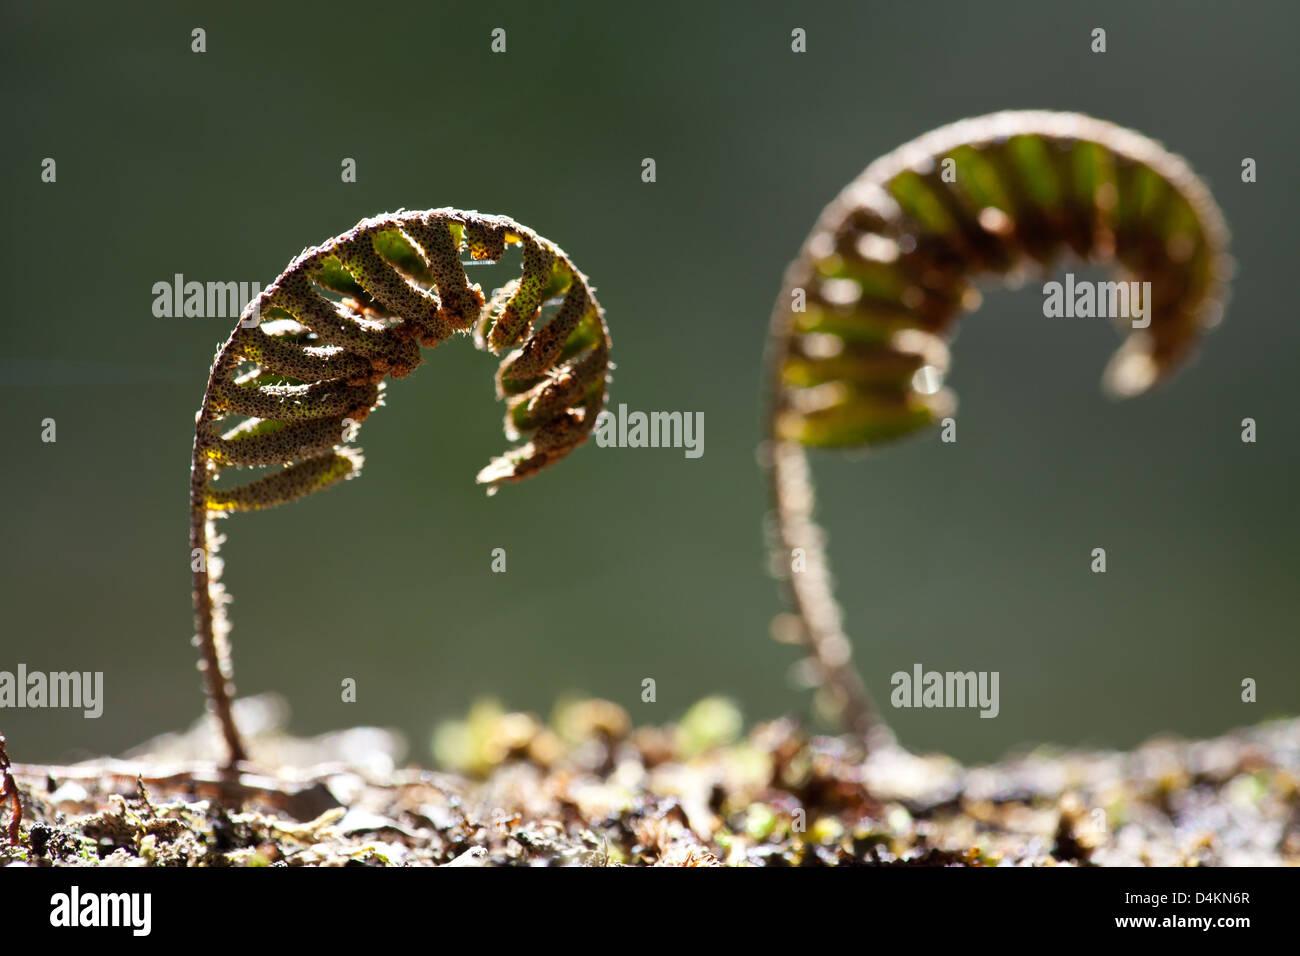 Beautiful ferns in La Amistad national park, Chiriqui province, Republic of Panama. Stock Photo